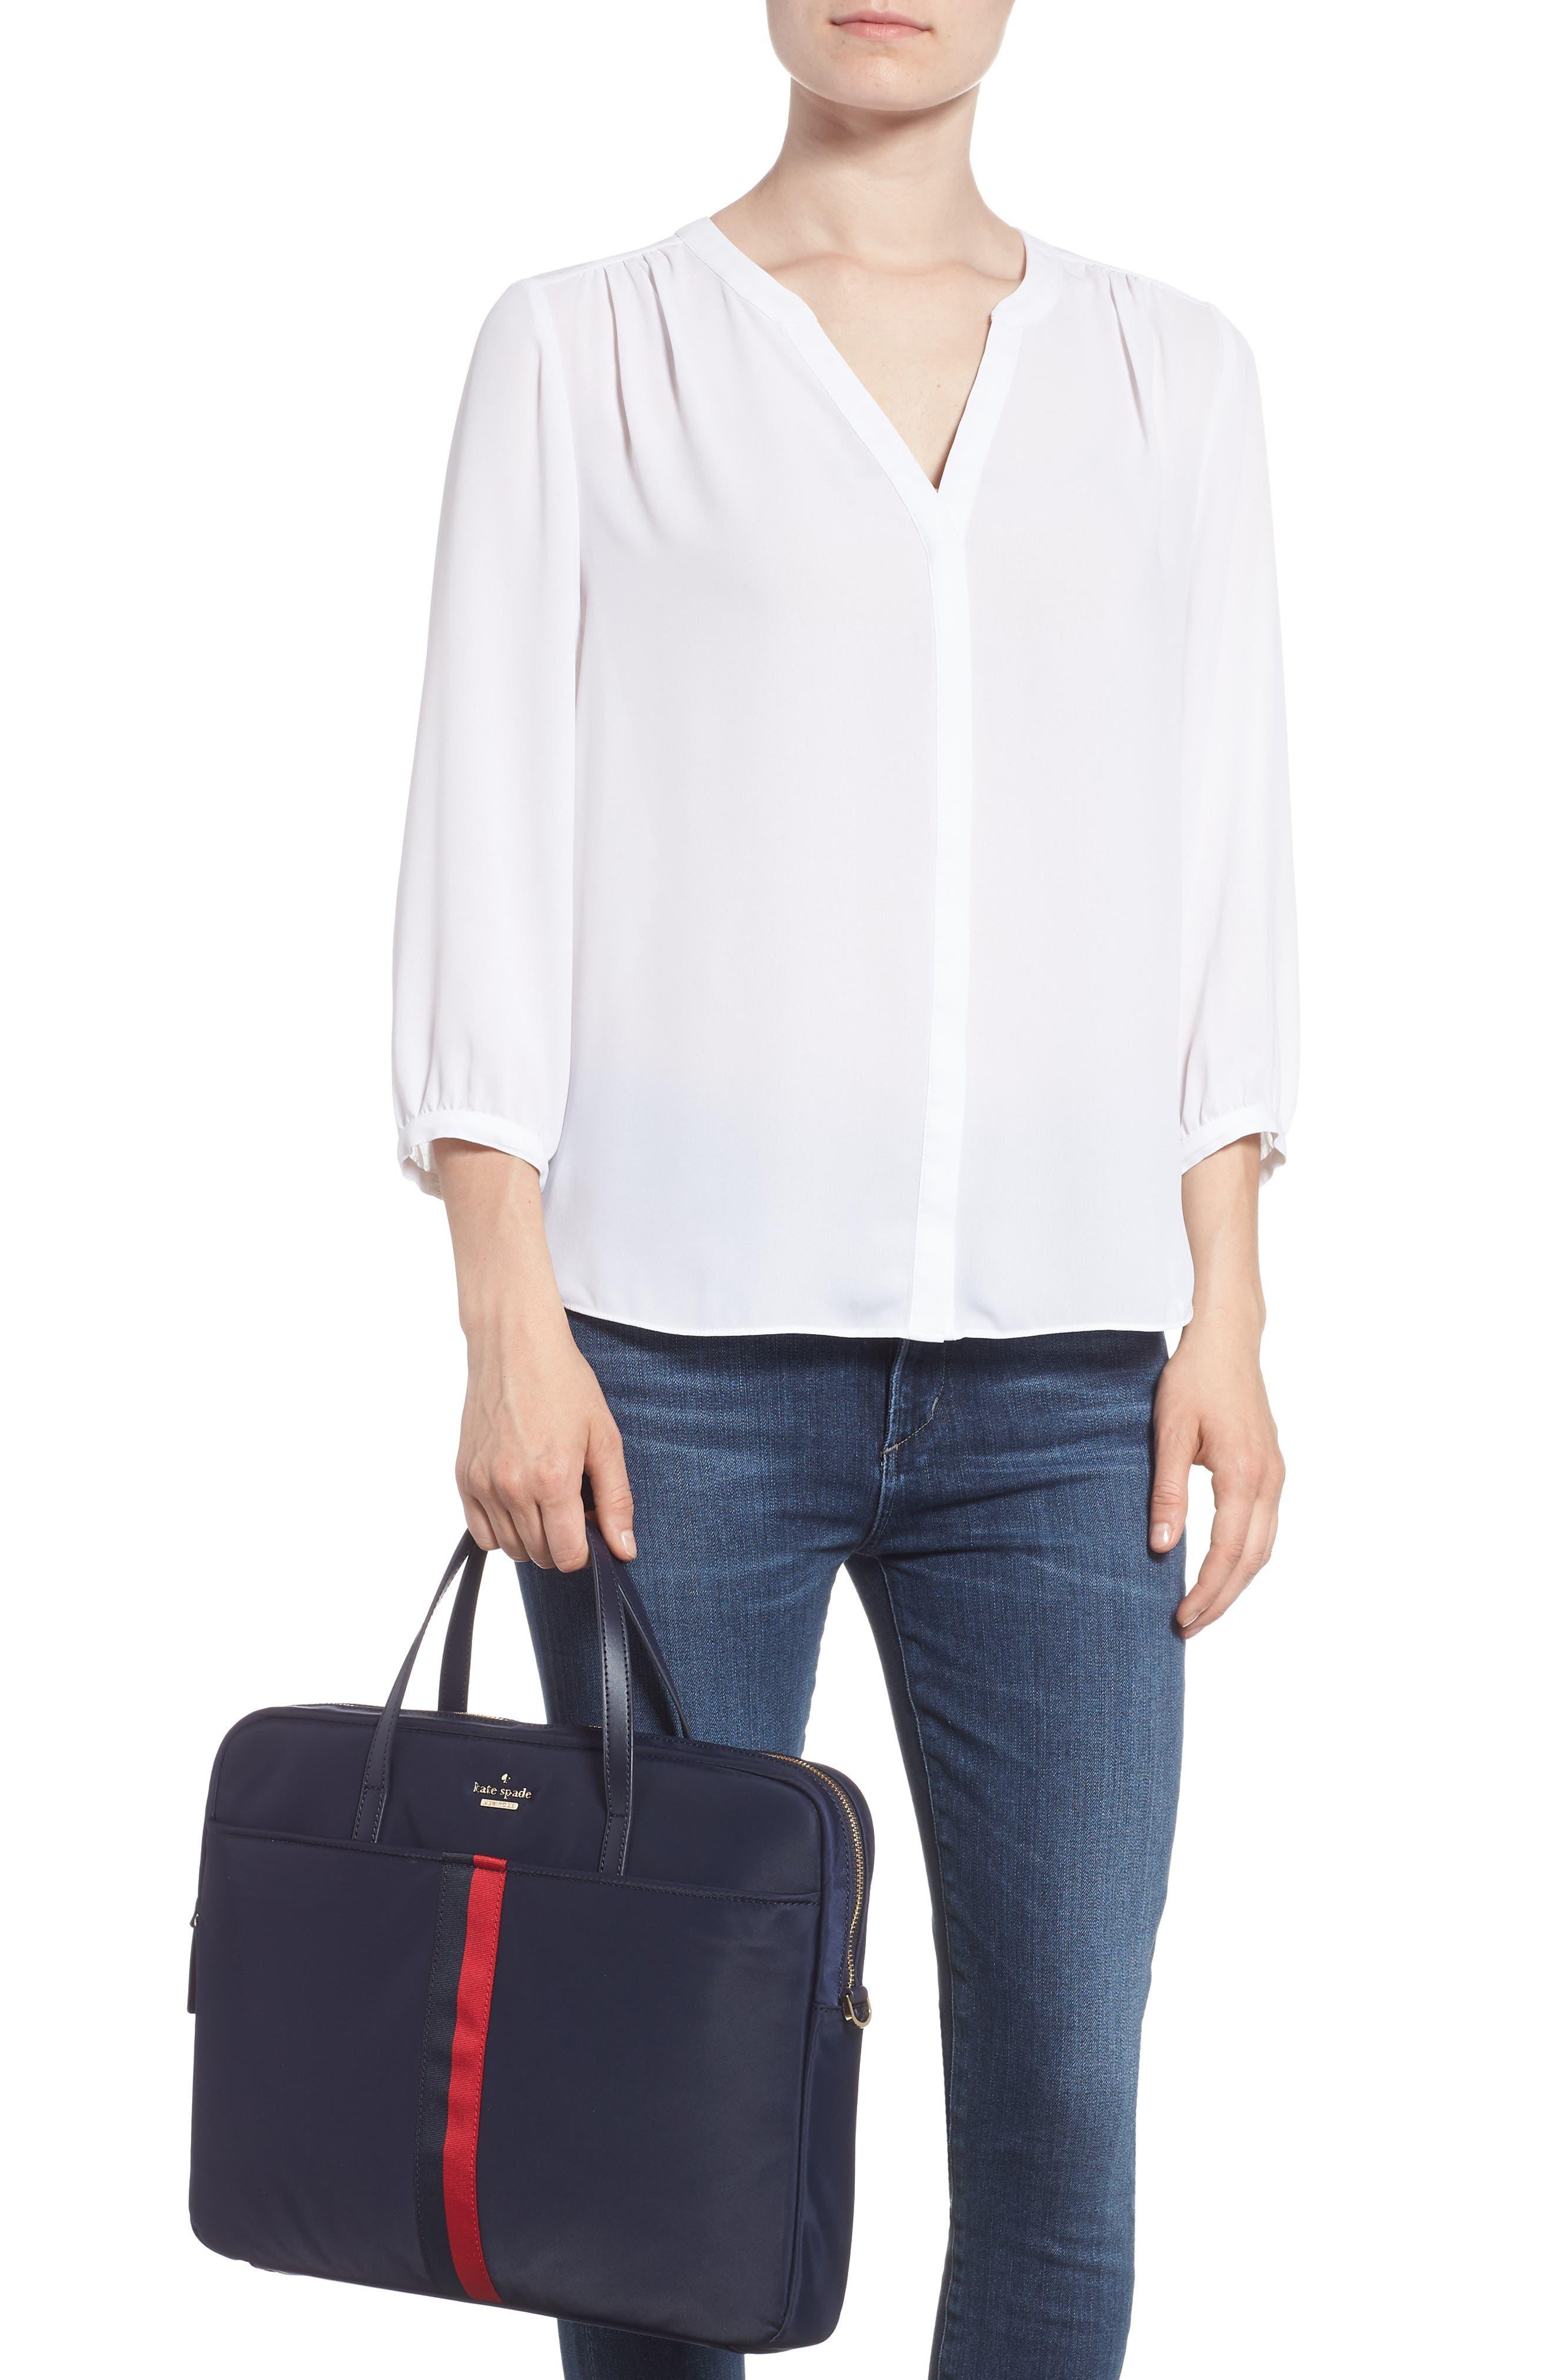 varsity stripe 15-inch laptop bag,                             Alternate thumbnail 2, color,                             493